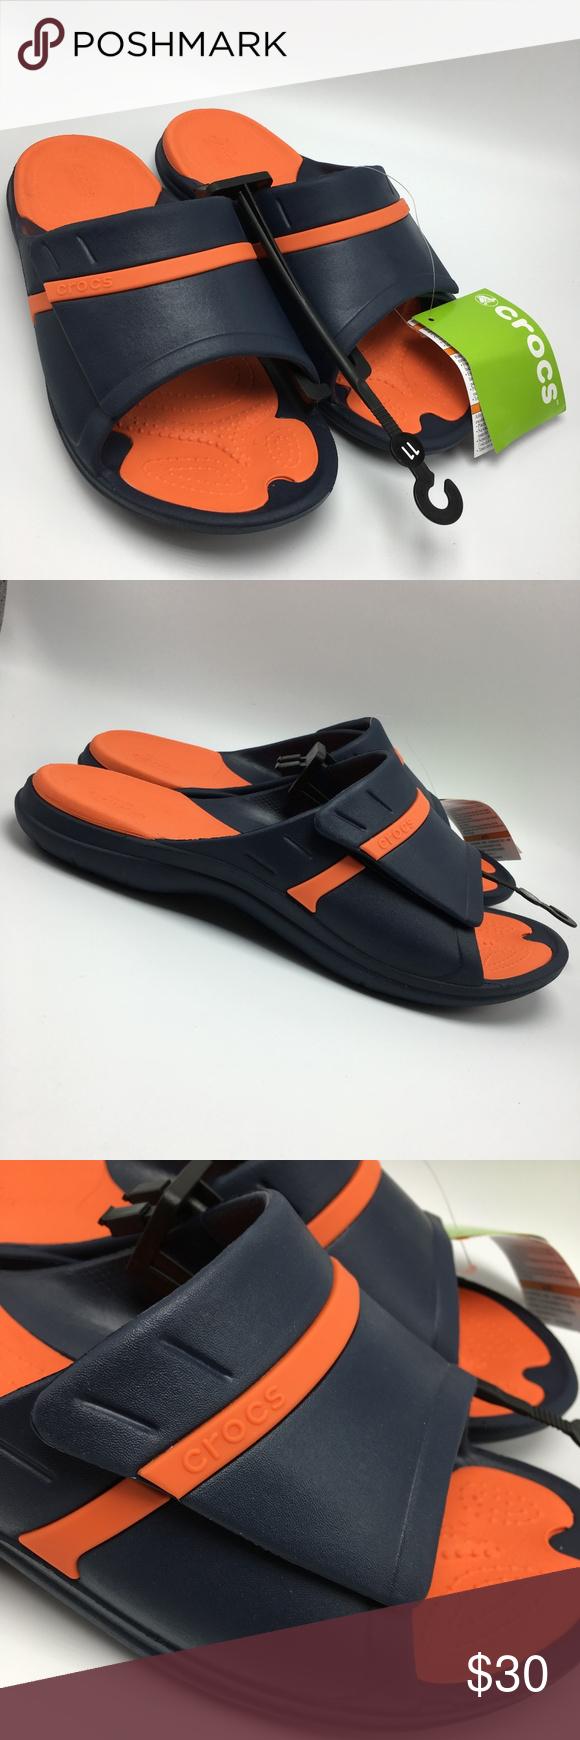 4ad0da884597 Crocs Modi Sport Slide Sandals Navy Tangerine Brand new pair of Crocs men s